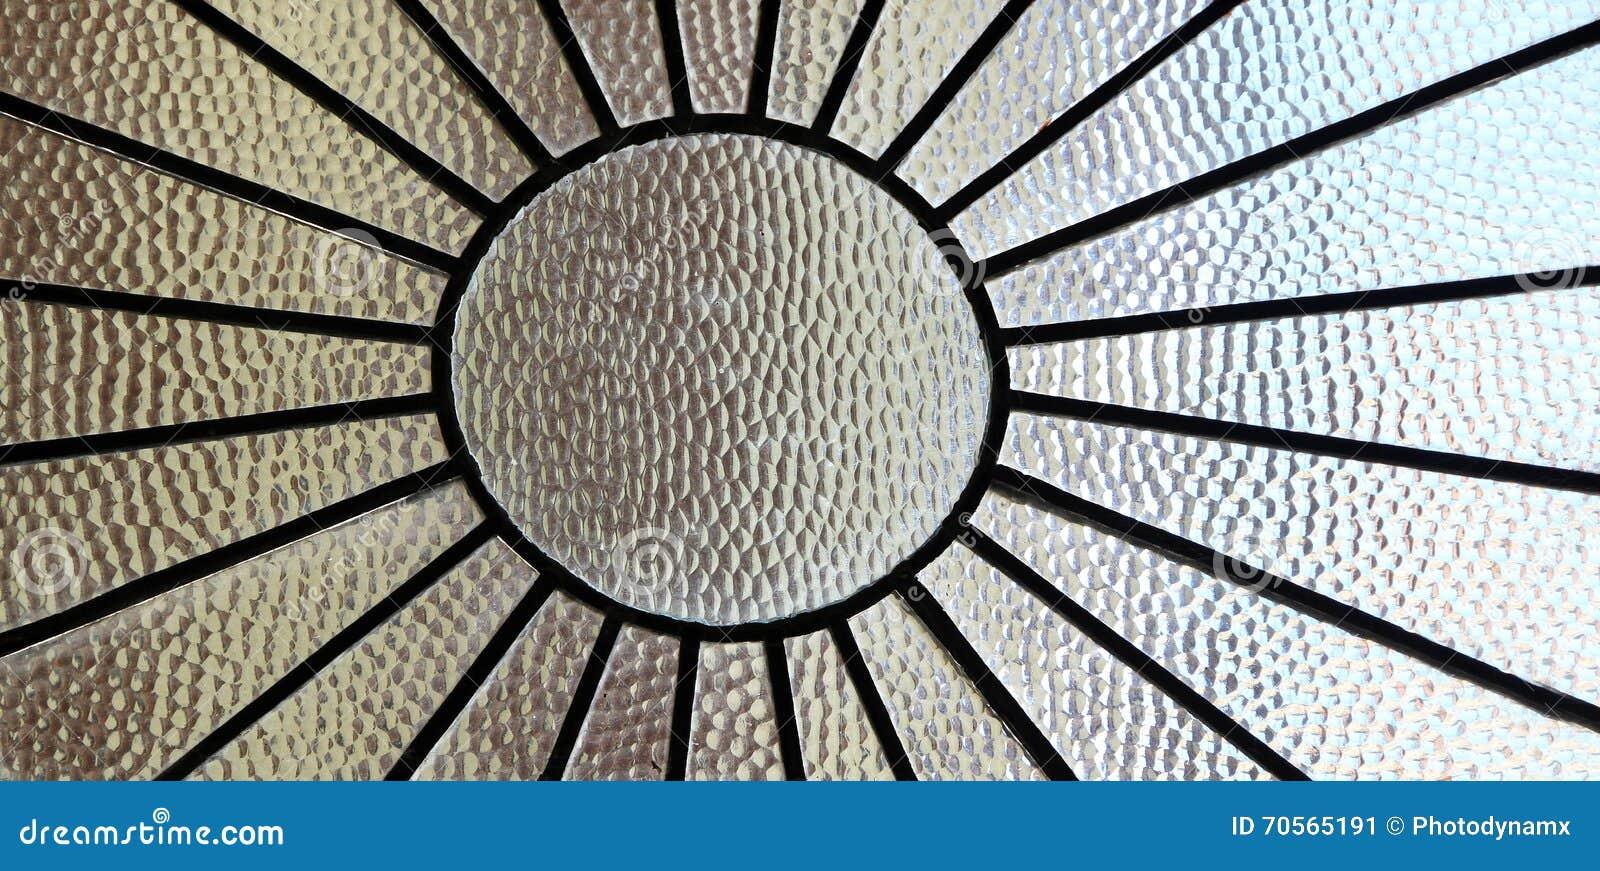 Glass window design - Art Deco Sunburst Glass Window Design